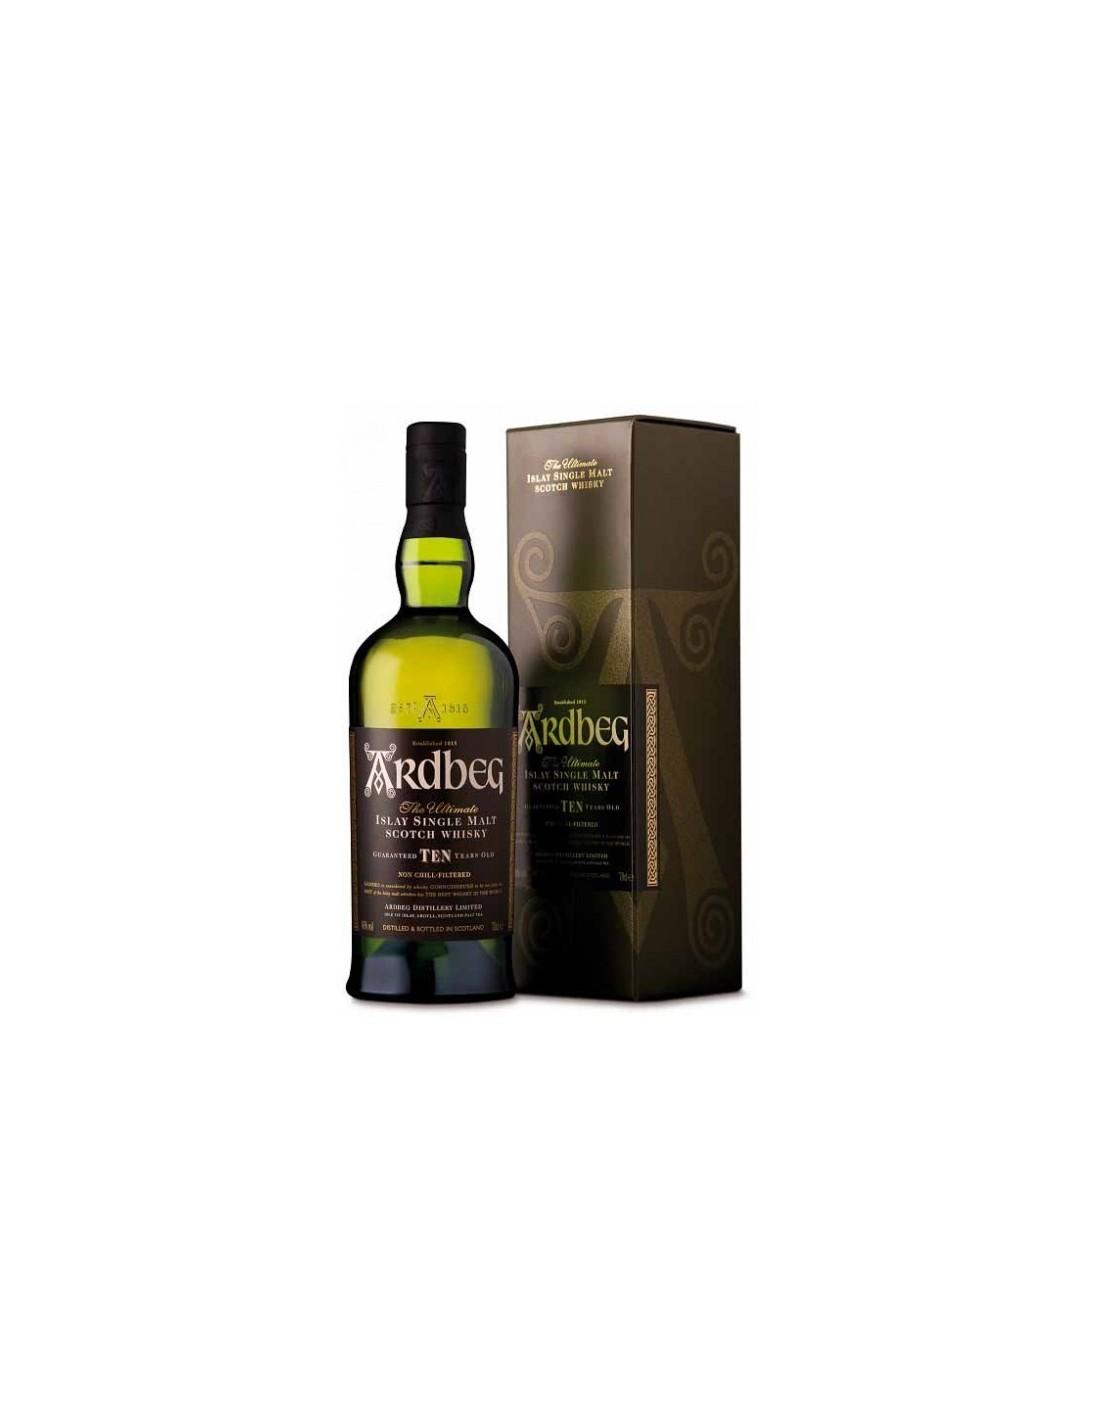 Whisky Ardbeg, 10 ani, 46% alc., 0.7L, Scotia